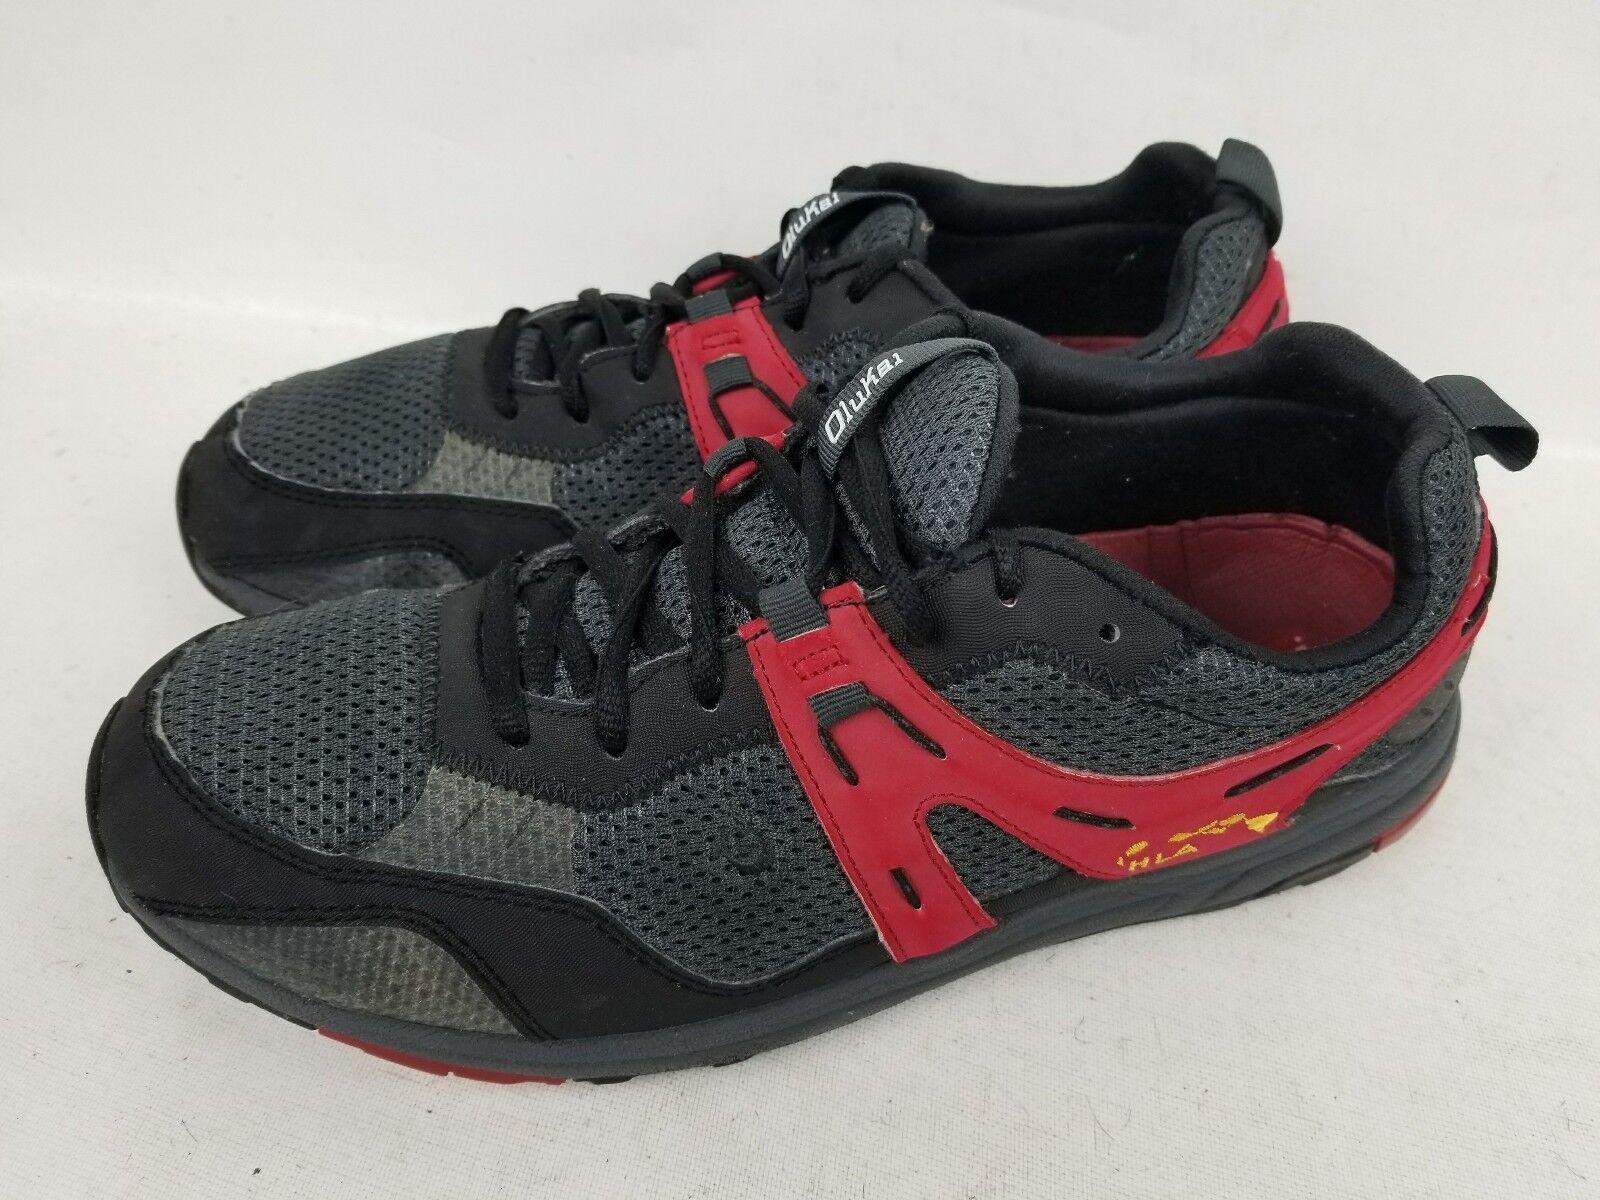 Olukai Men's Athletic Walking Running Training Black  Shoes SZ US 10.5